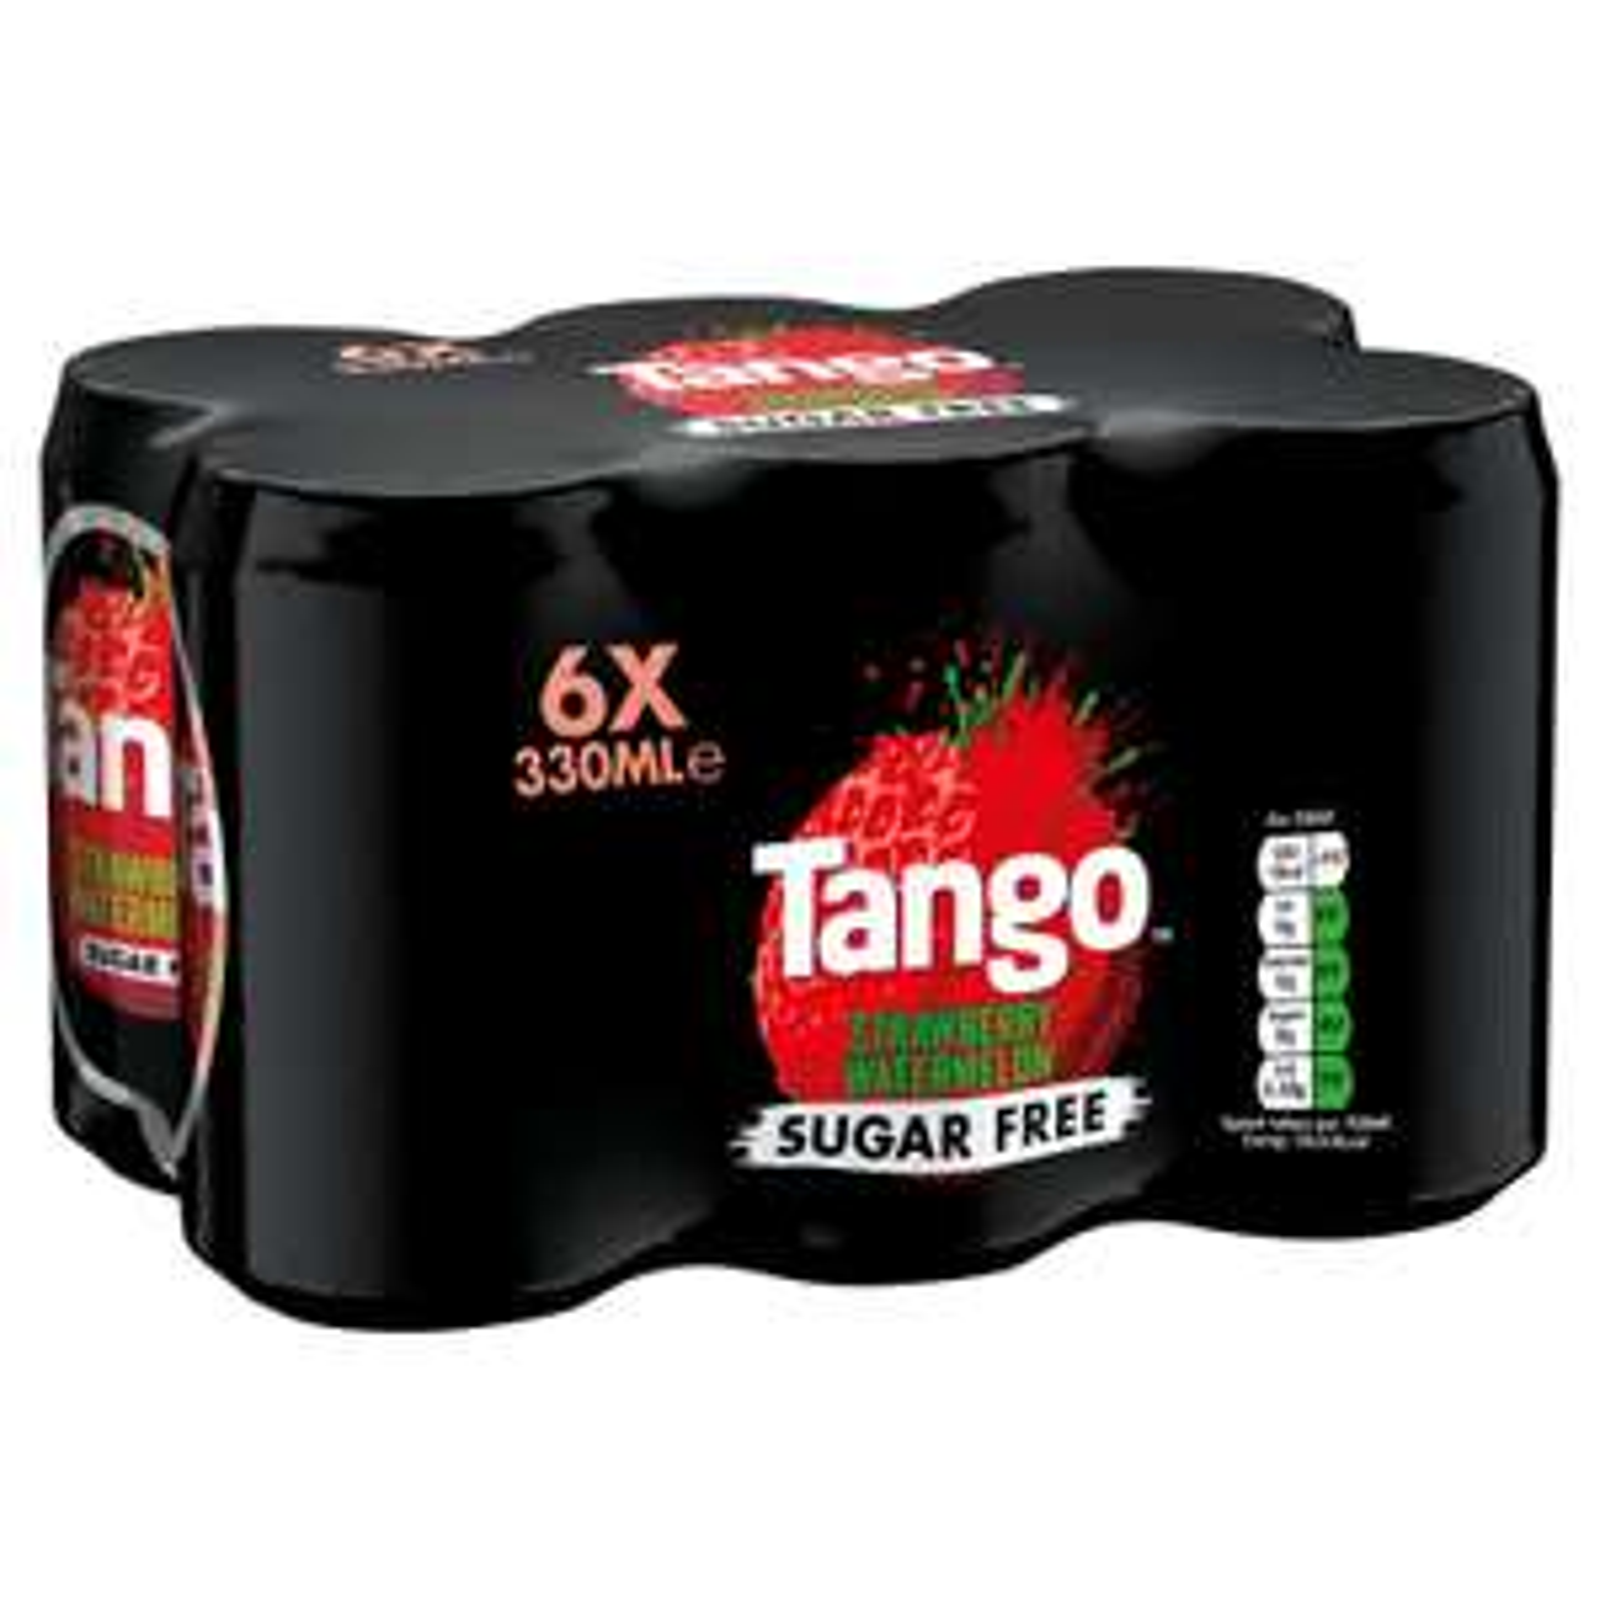 Tango 6 X 330ml Sugar Free Strawberry Watermelon / Orange / 7UP, £1.50 @ Iceland